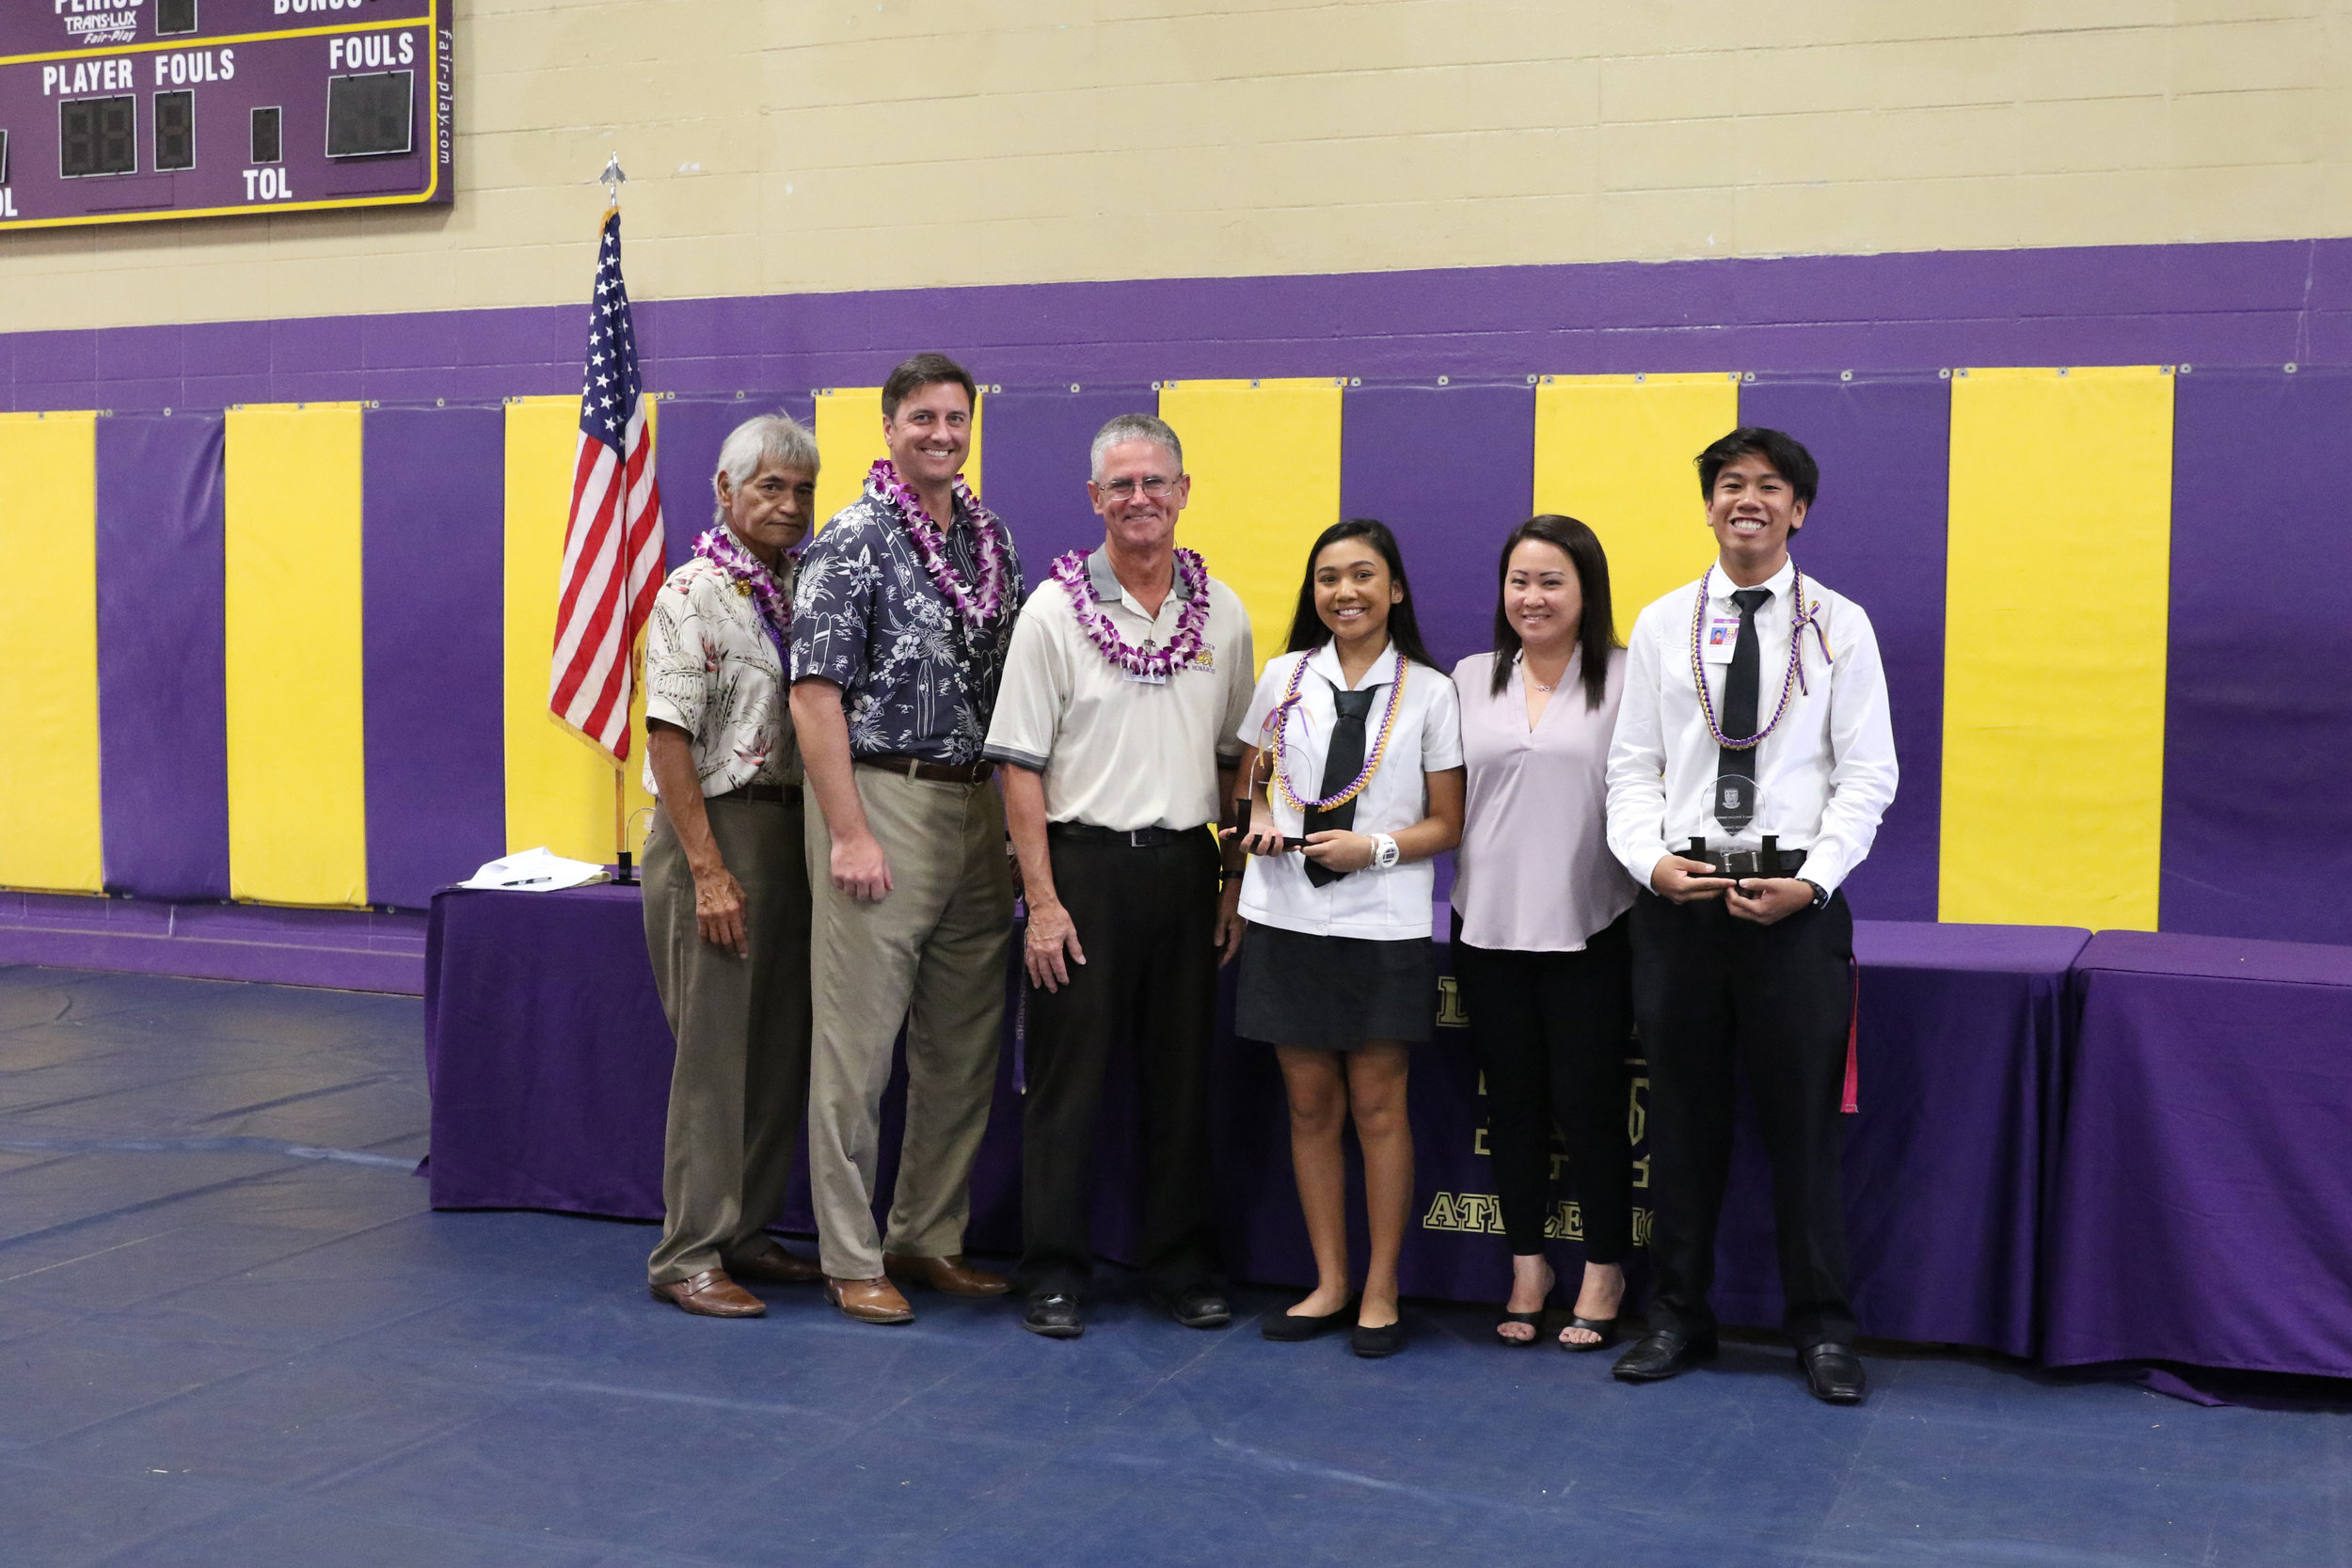 DMS Athletic Major Service Award